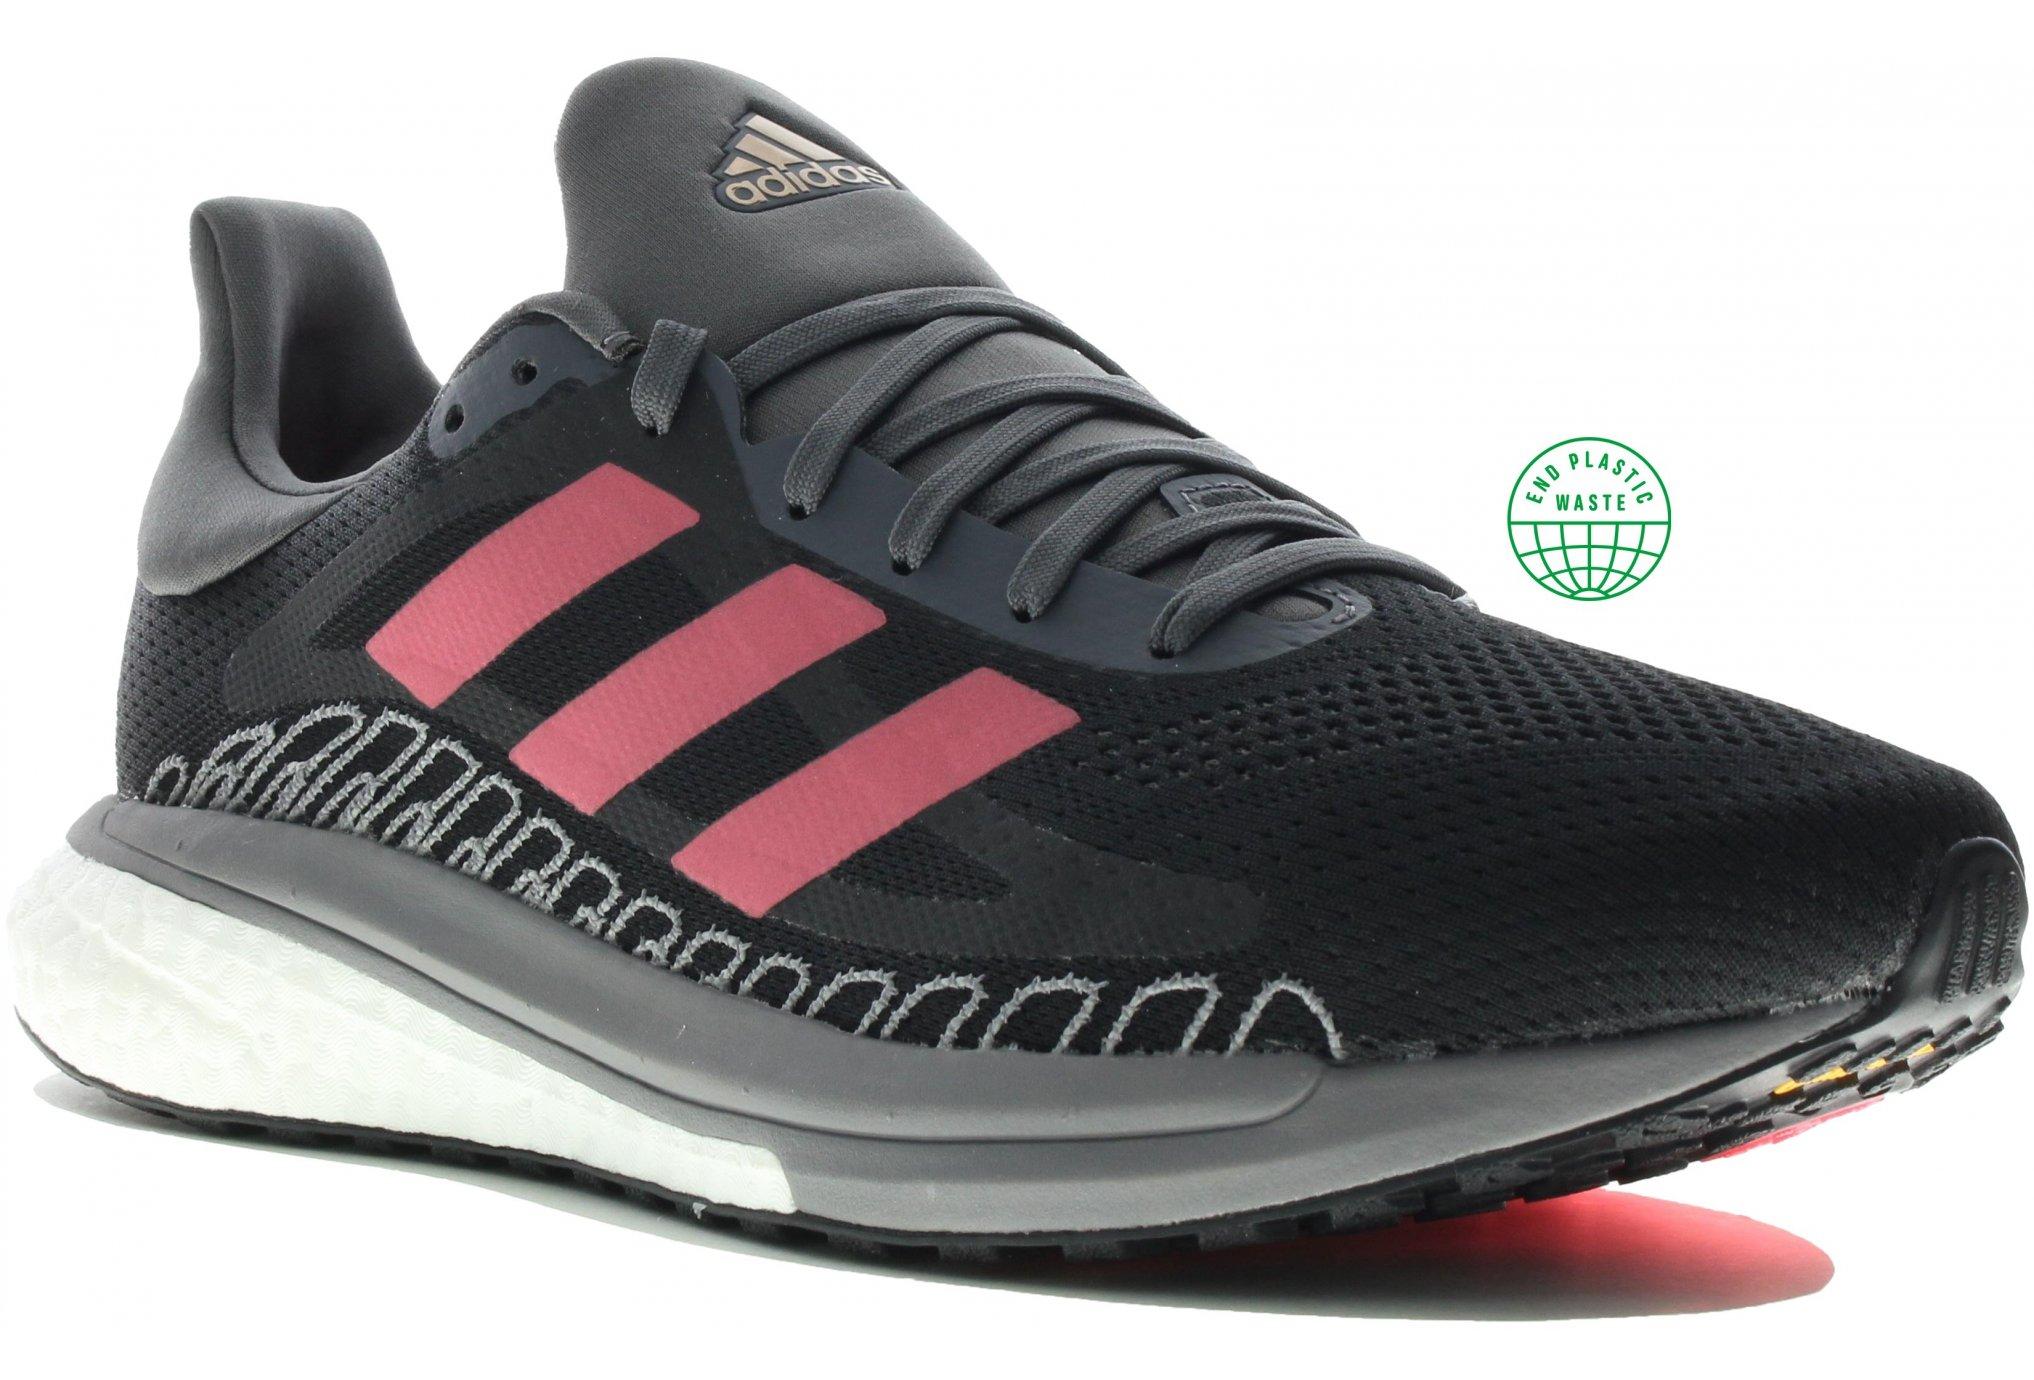 adidas Solar Glide ST 3 Primegreen Chaussures homme